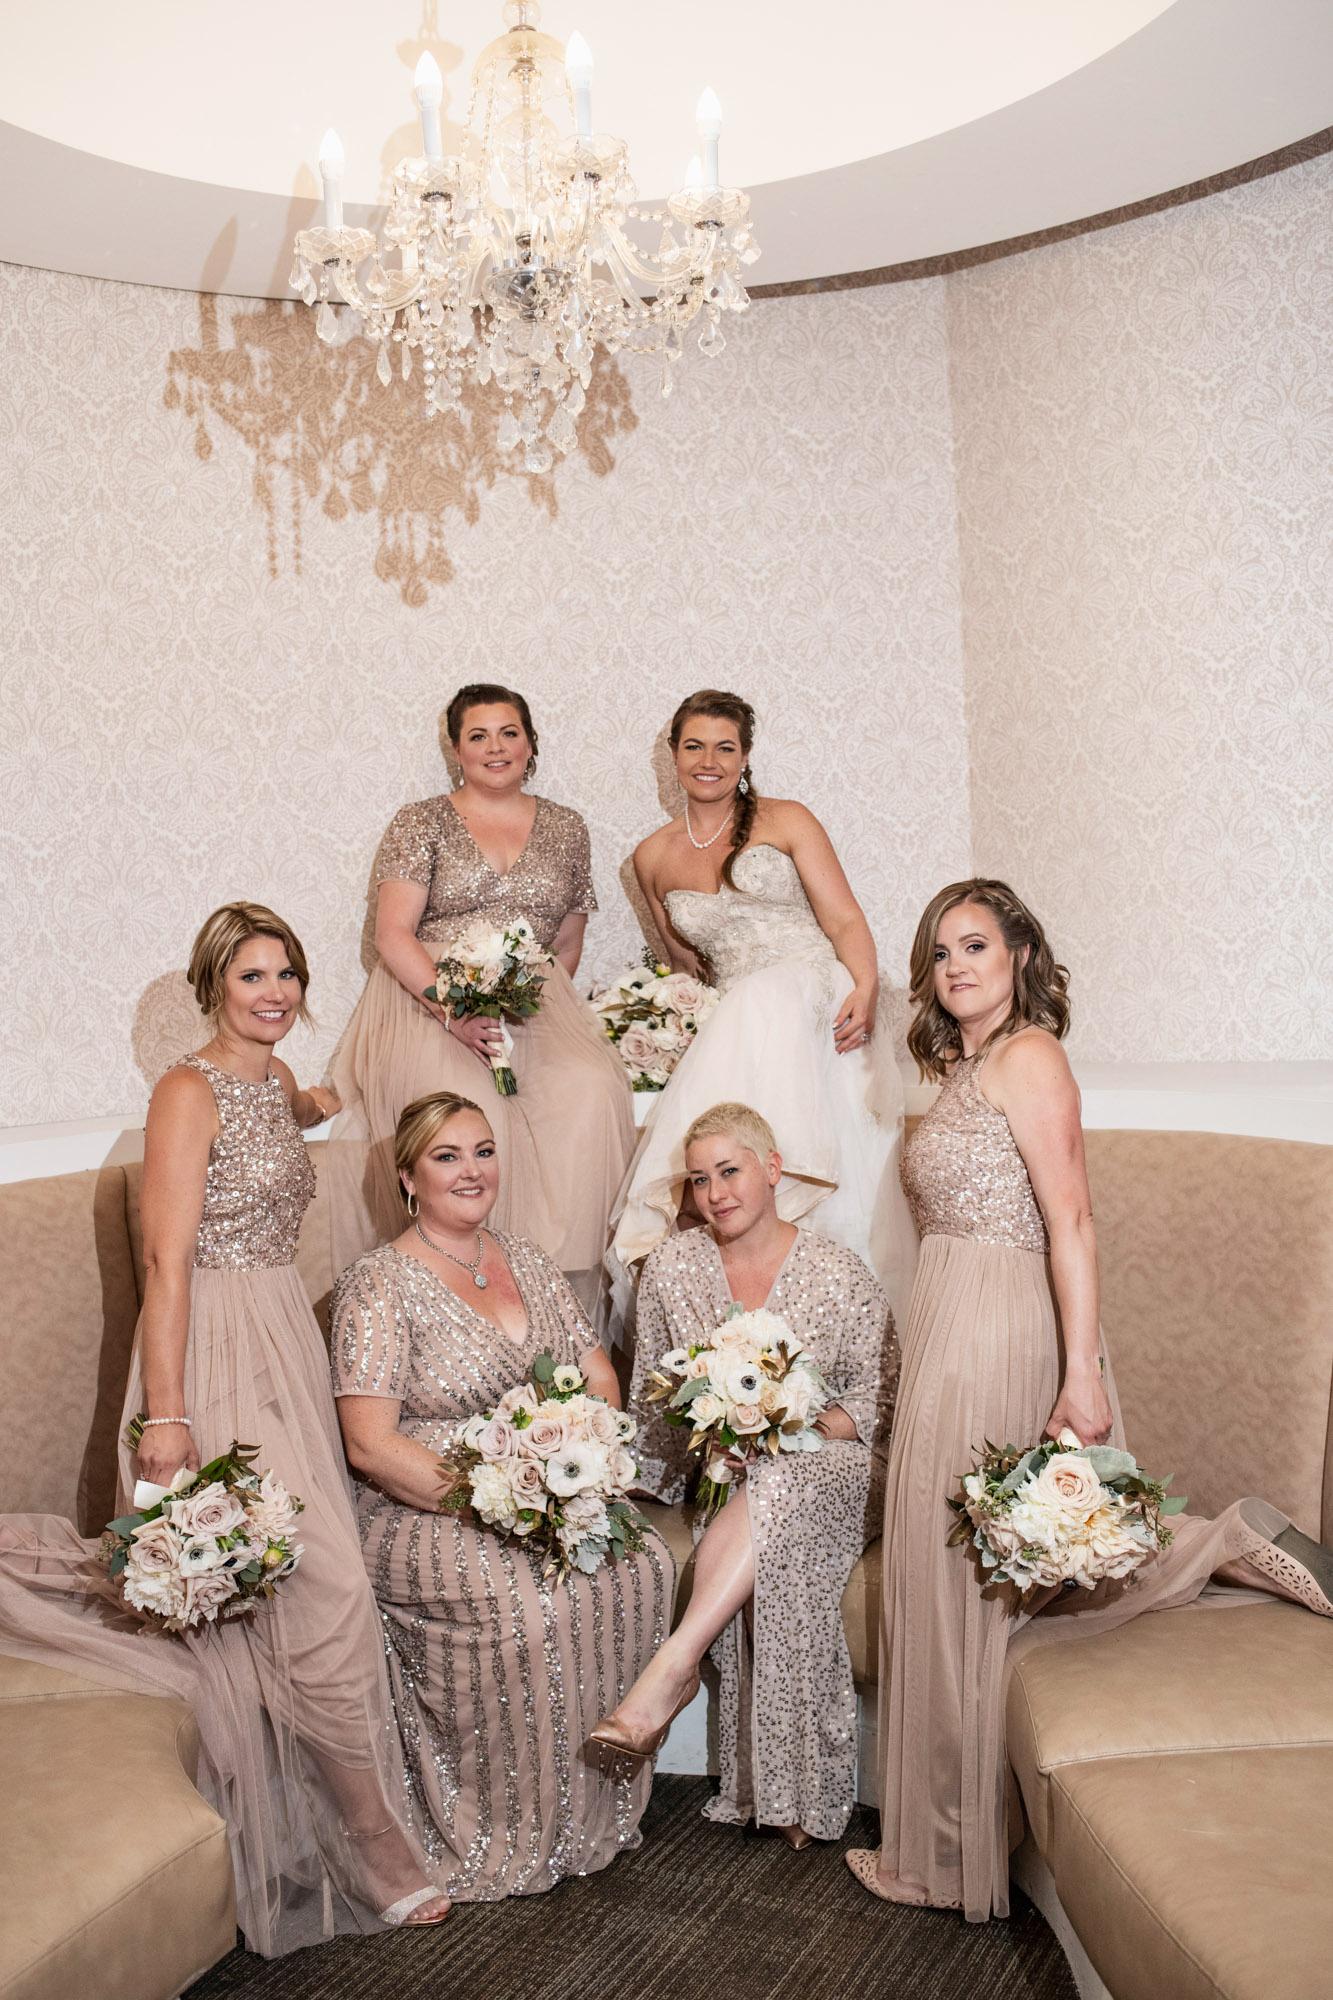 #lasvegasweddingplanners, #weddingplannerlasvegas, #weddingcoordinators, #lasvegasweddingcoordinators, #havanaroomlasvegaswedding #tropicanalasvegas #troplv #tropicanaweddinglasvegas #tropicanawedding #weddinglasvegas #luxuryweddingplanner #celebrityweddingplannerlasvegas #lasvegasstripwedding #Bridesmaids #bride #bouquets #bridalparty #flowers #weddingbouquets #bridesmaidsbouquet